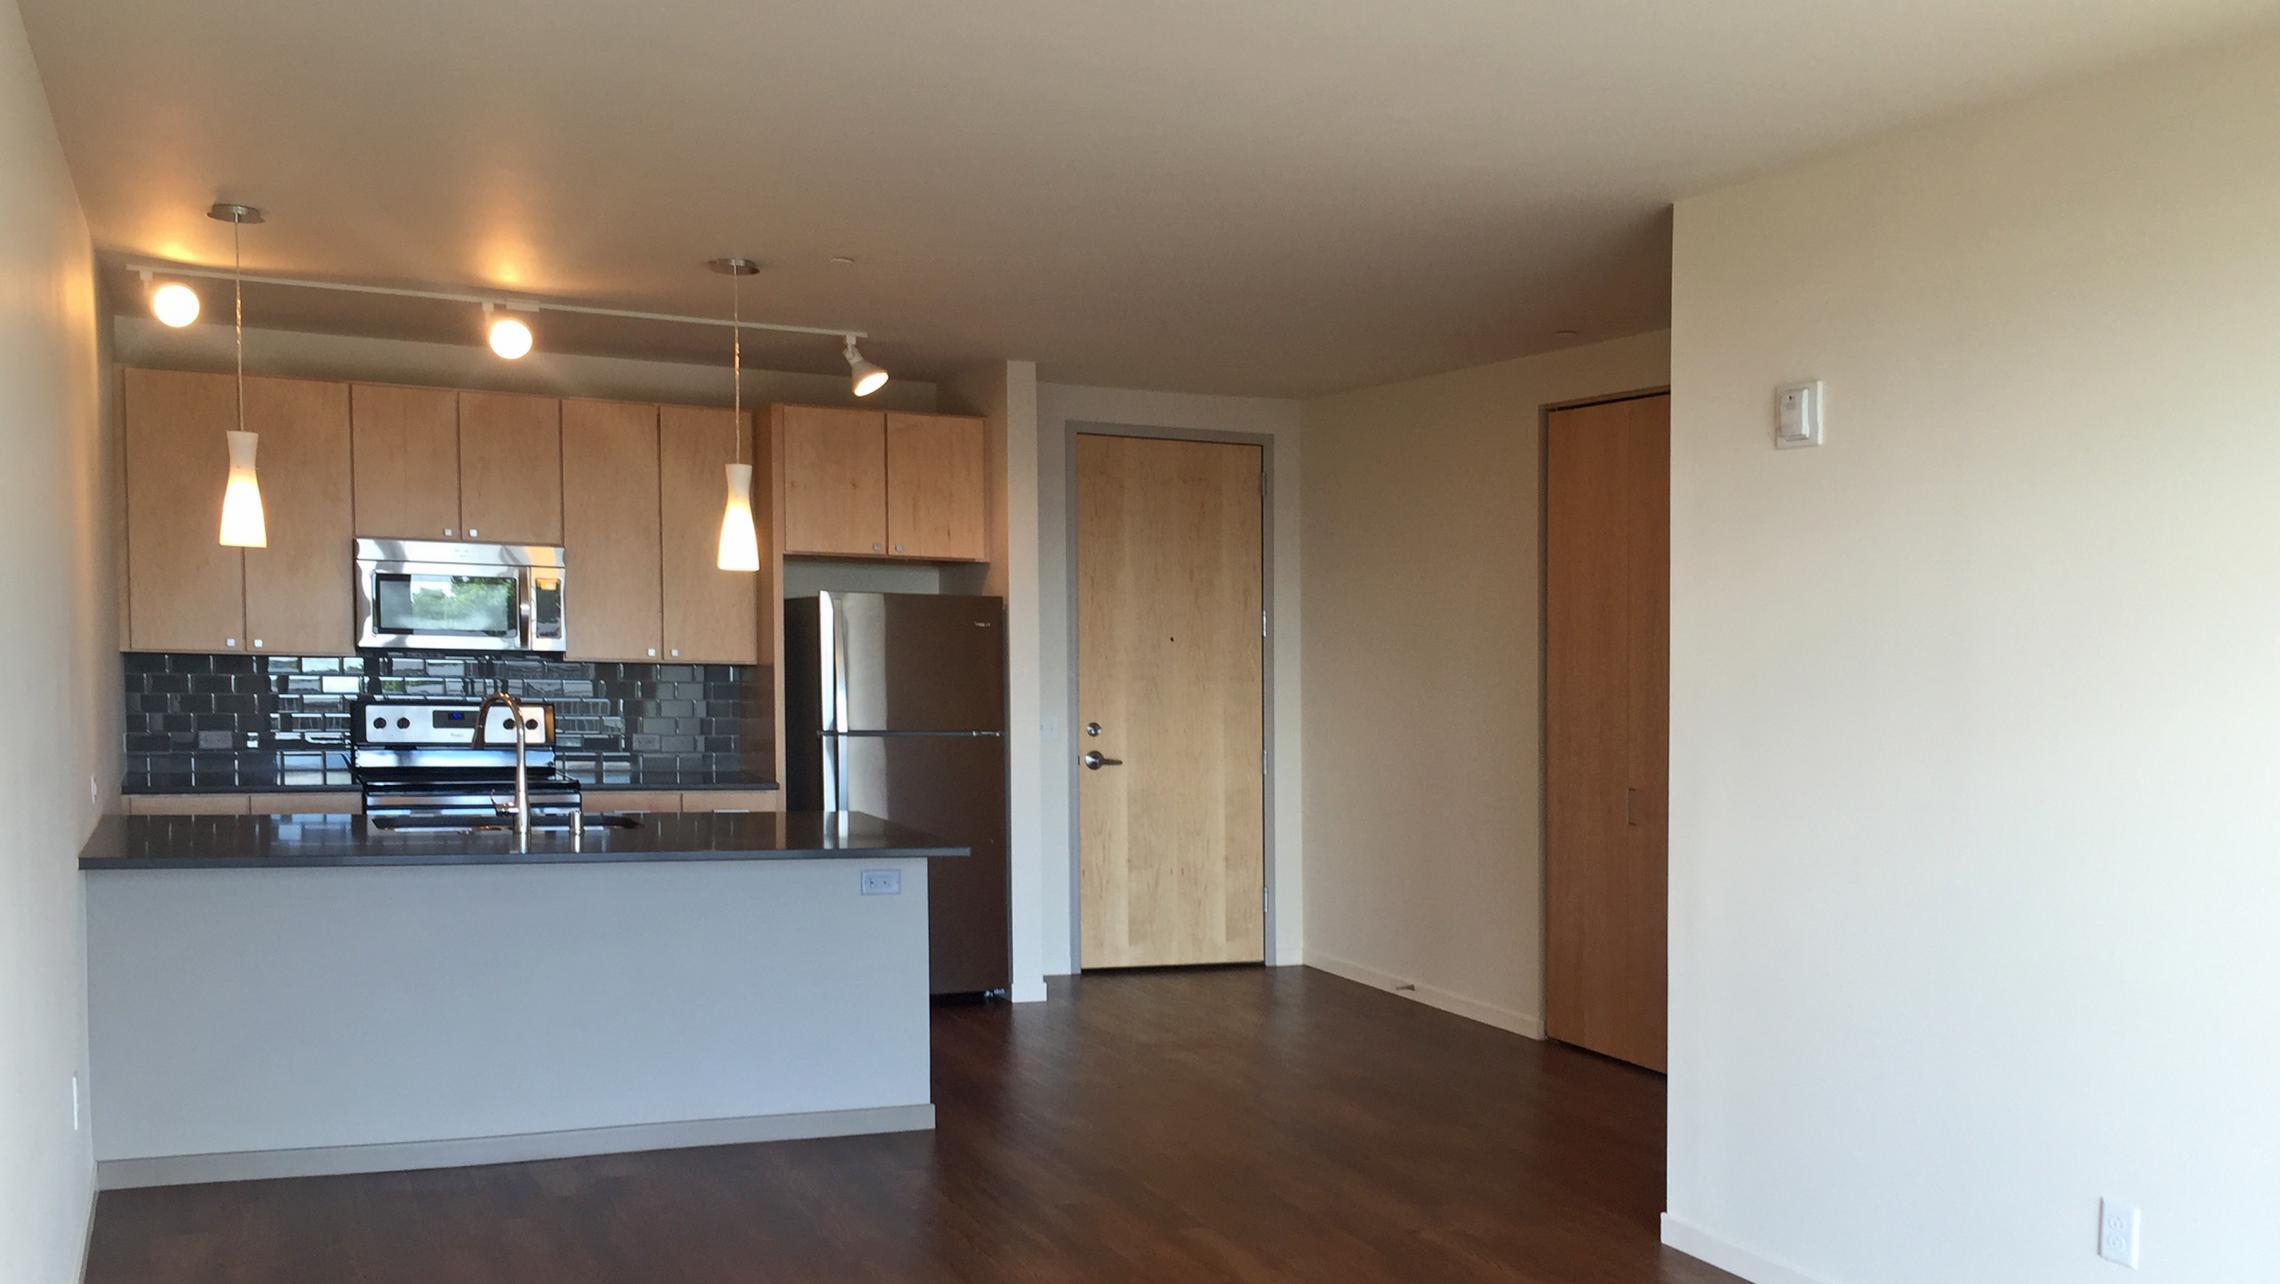 ULI Nine Line Apartment 223 - Kitchen with Natural Light